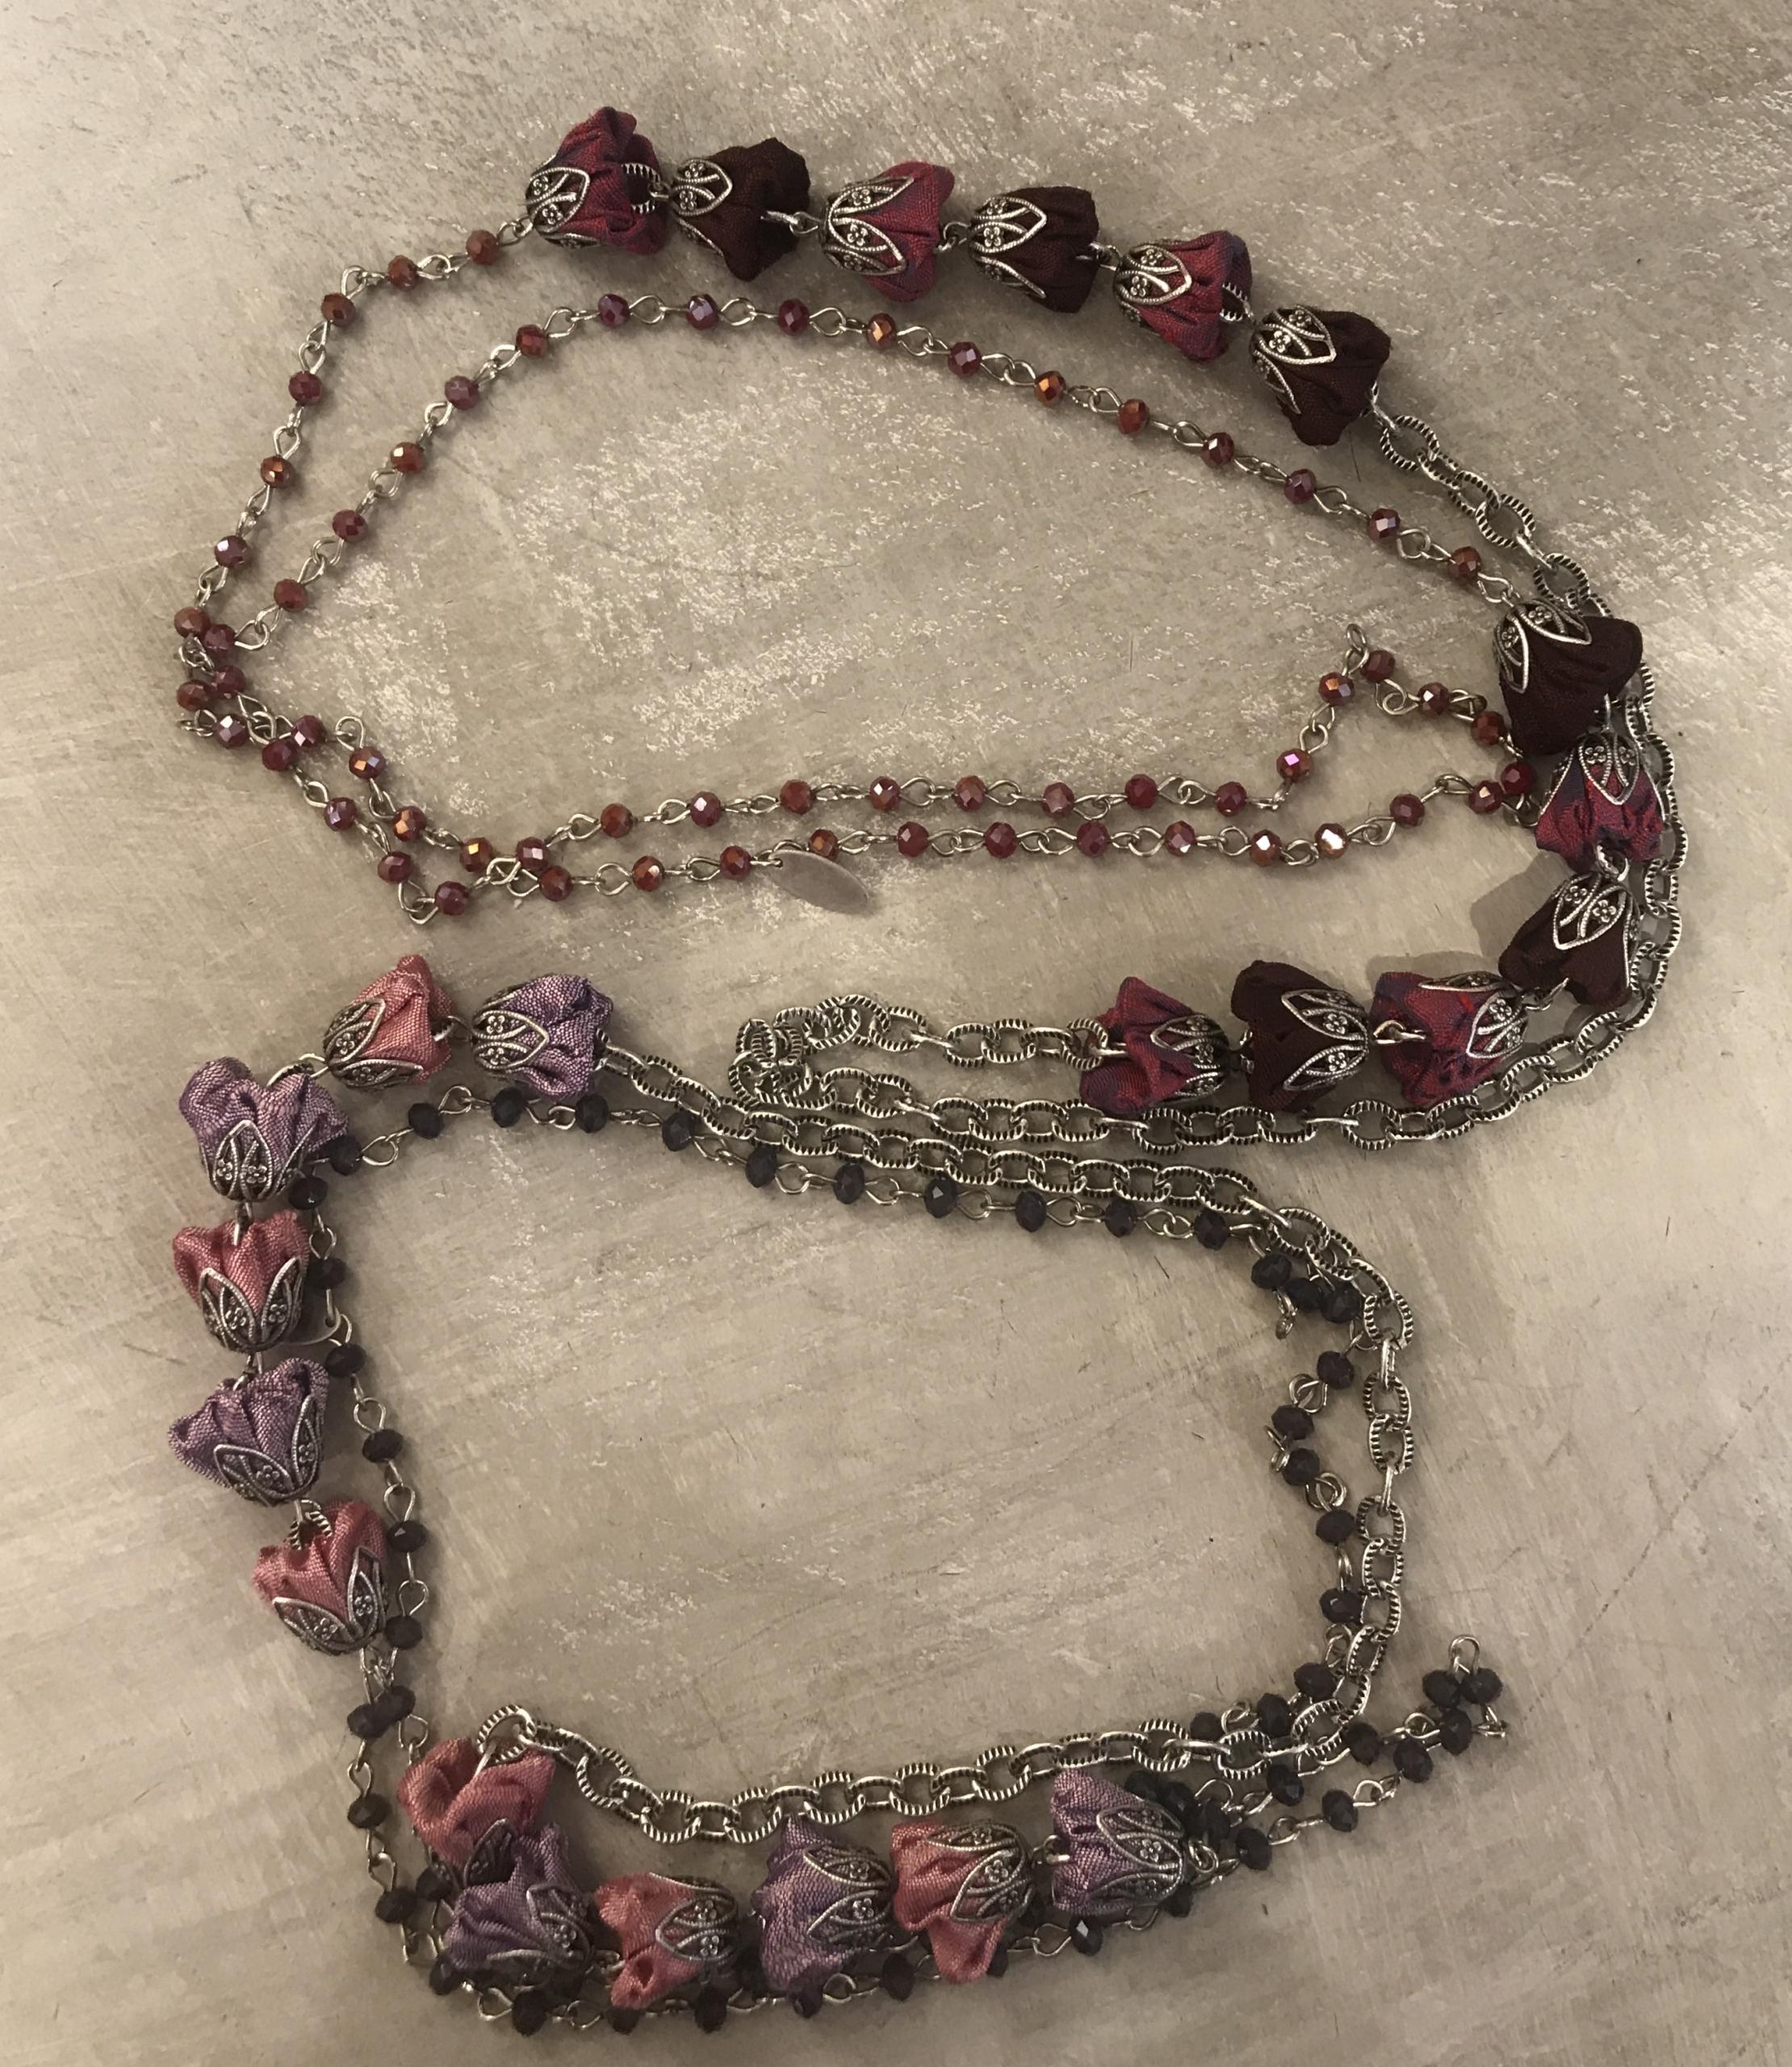 Collana lunga con cristalli e rose in shantung